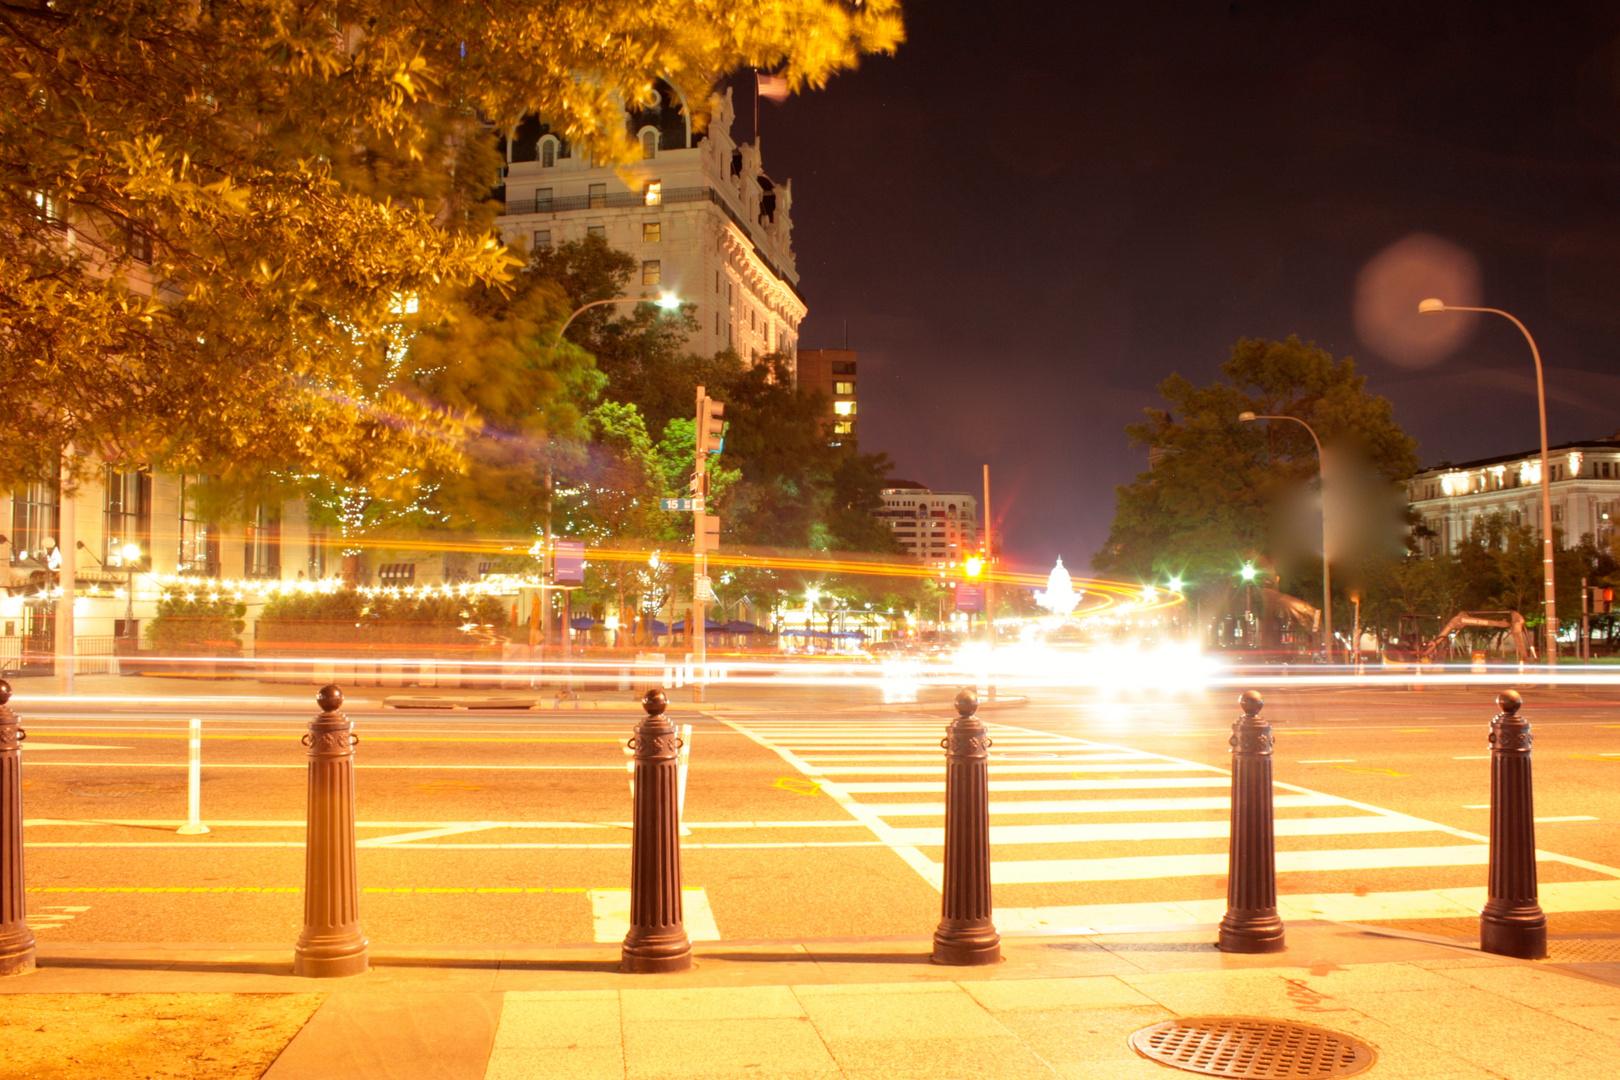 Street of Washington D.C